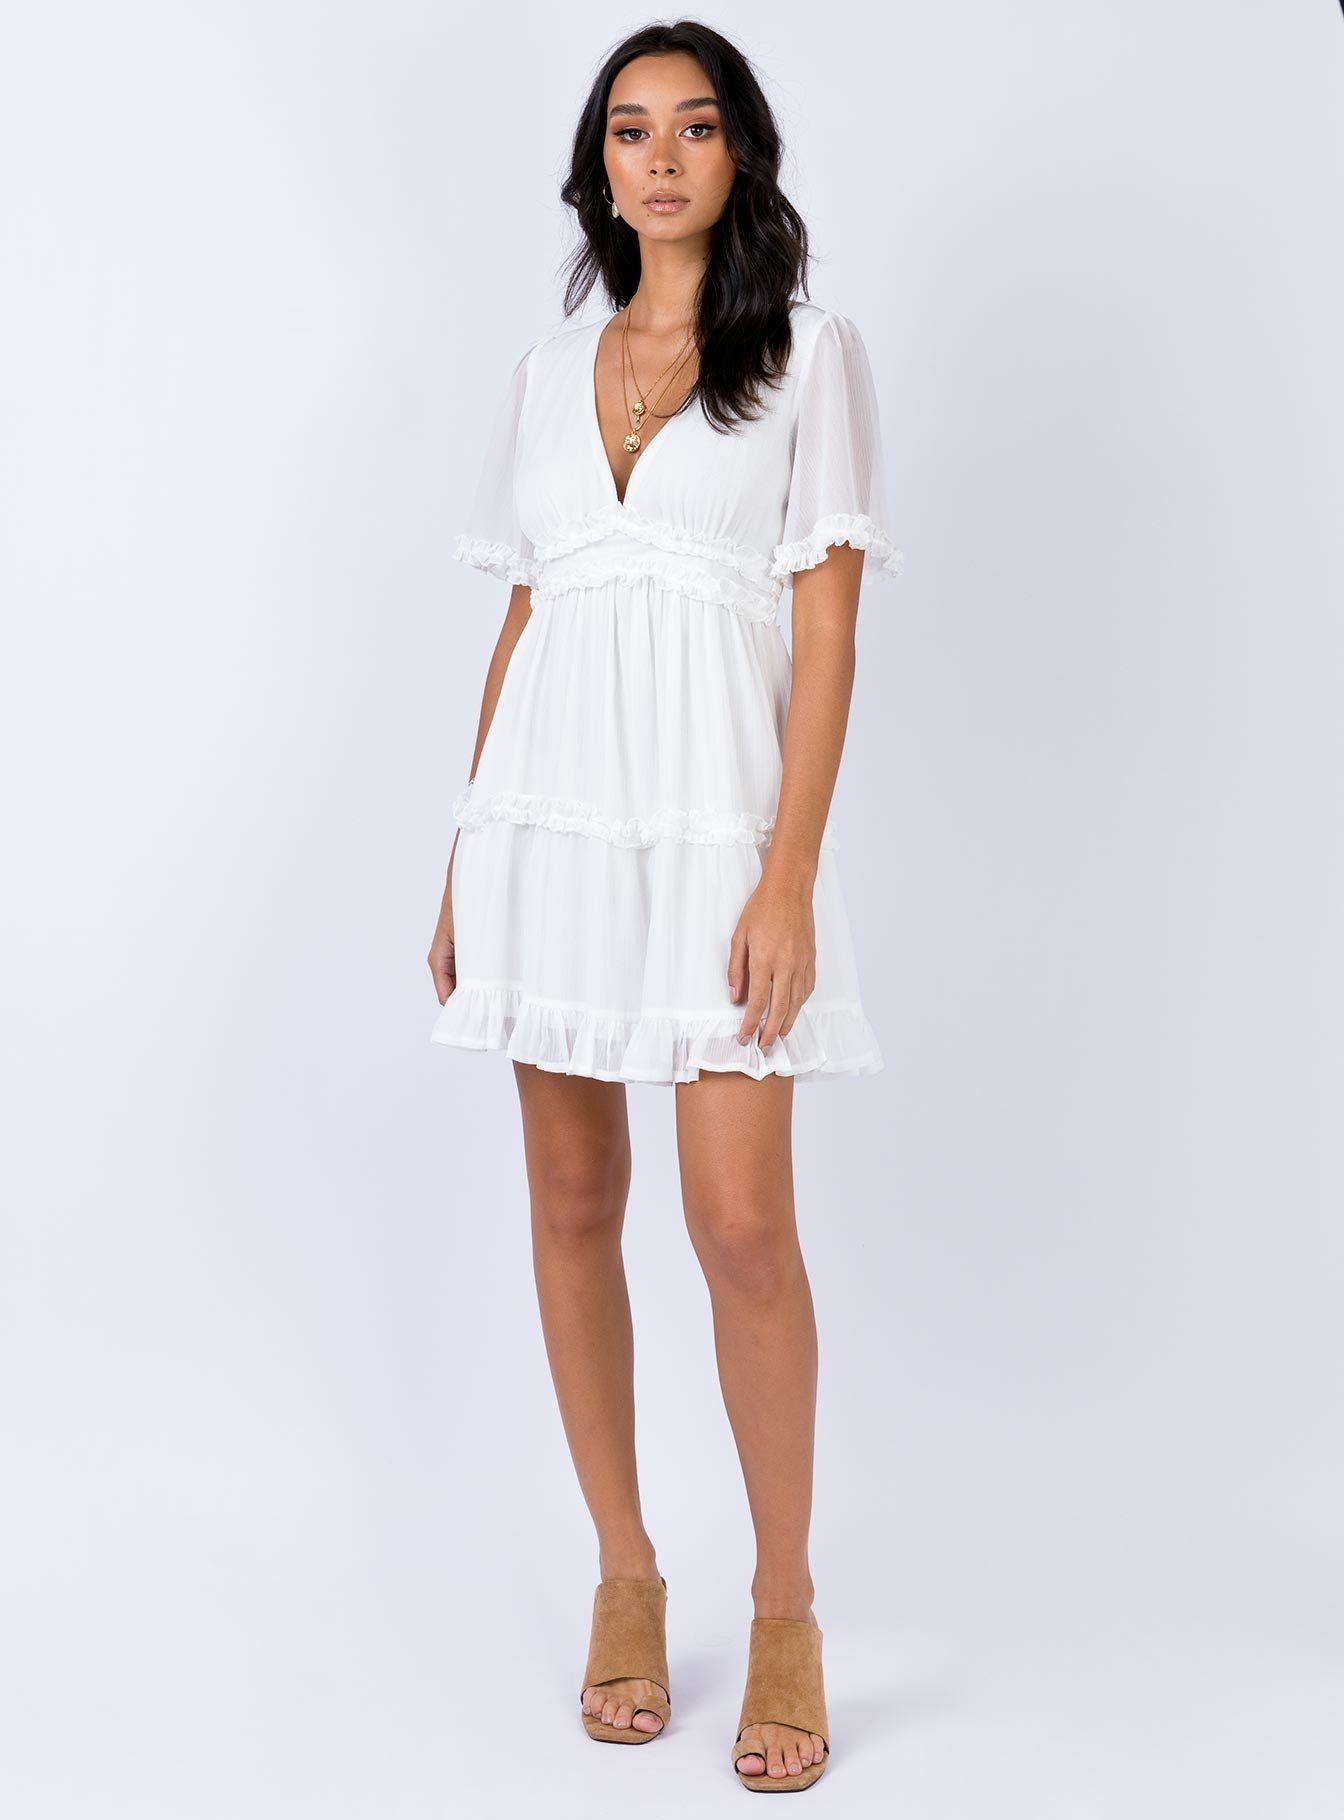 Ferocity Mini Dress White Flowy Mini Dress White Short Sleeve Dress White Flowy Dress